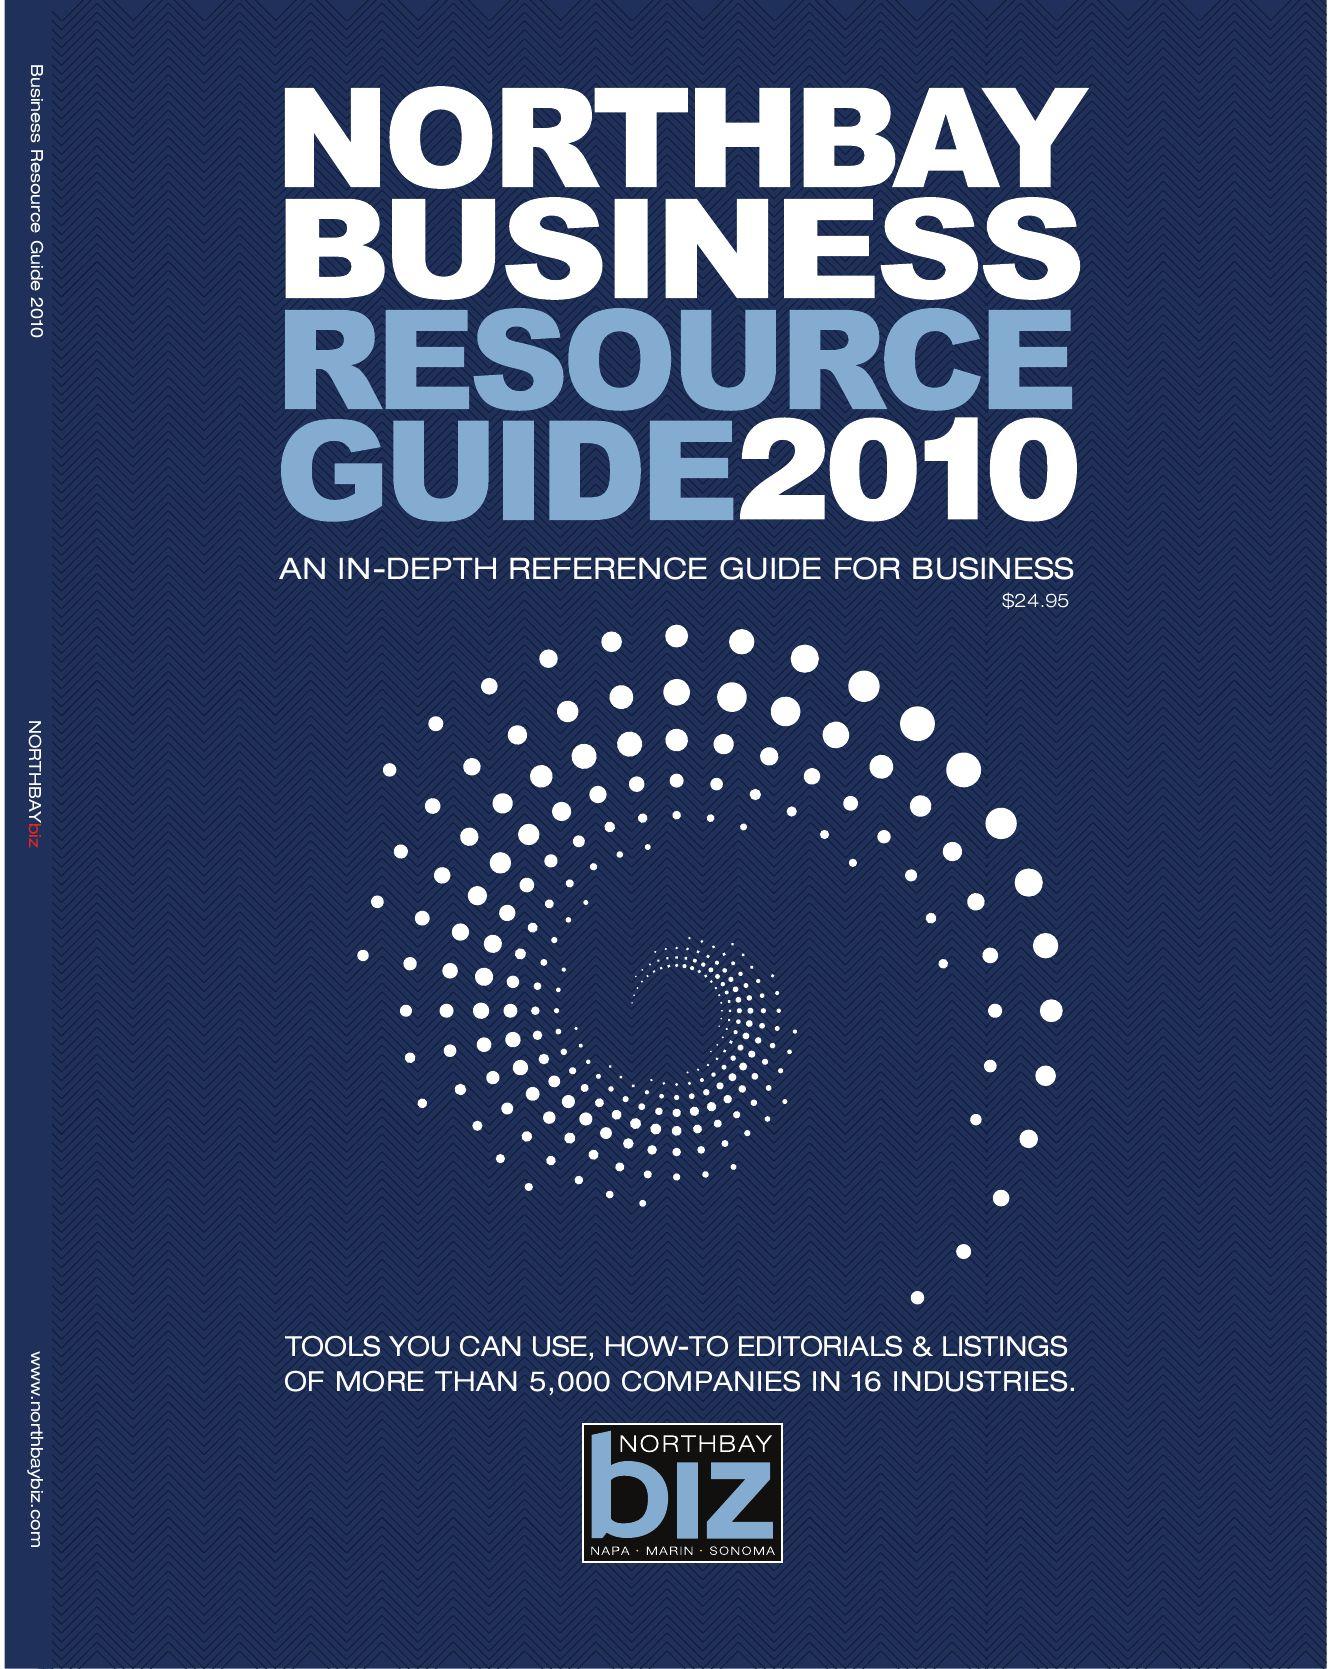 Maison Du Convertible Sebastopol north bay business resource guide 2010northbay biz - issuu